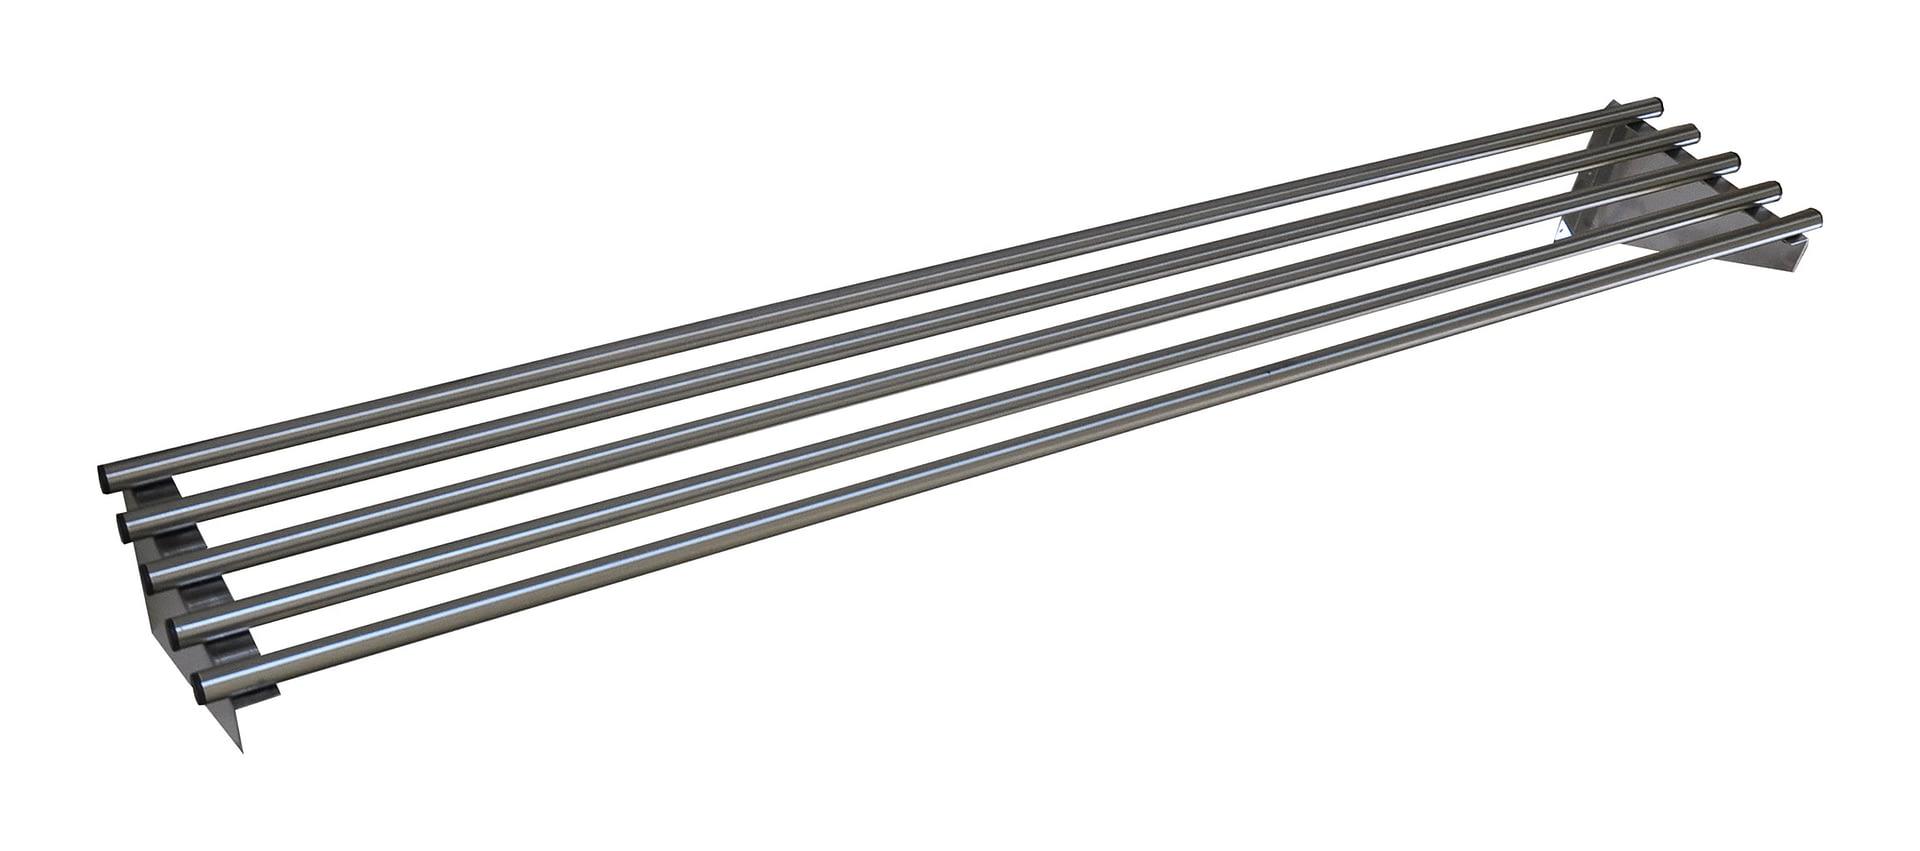 Stainless Steel Pipe Wall Shelf, 1800 X 300mm deep